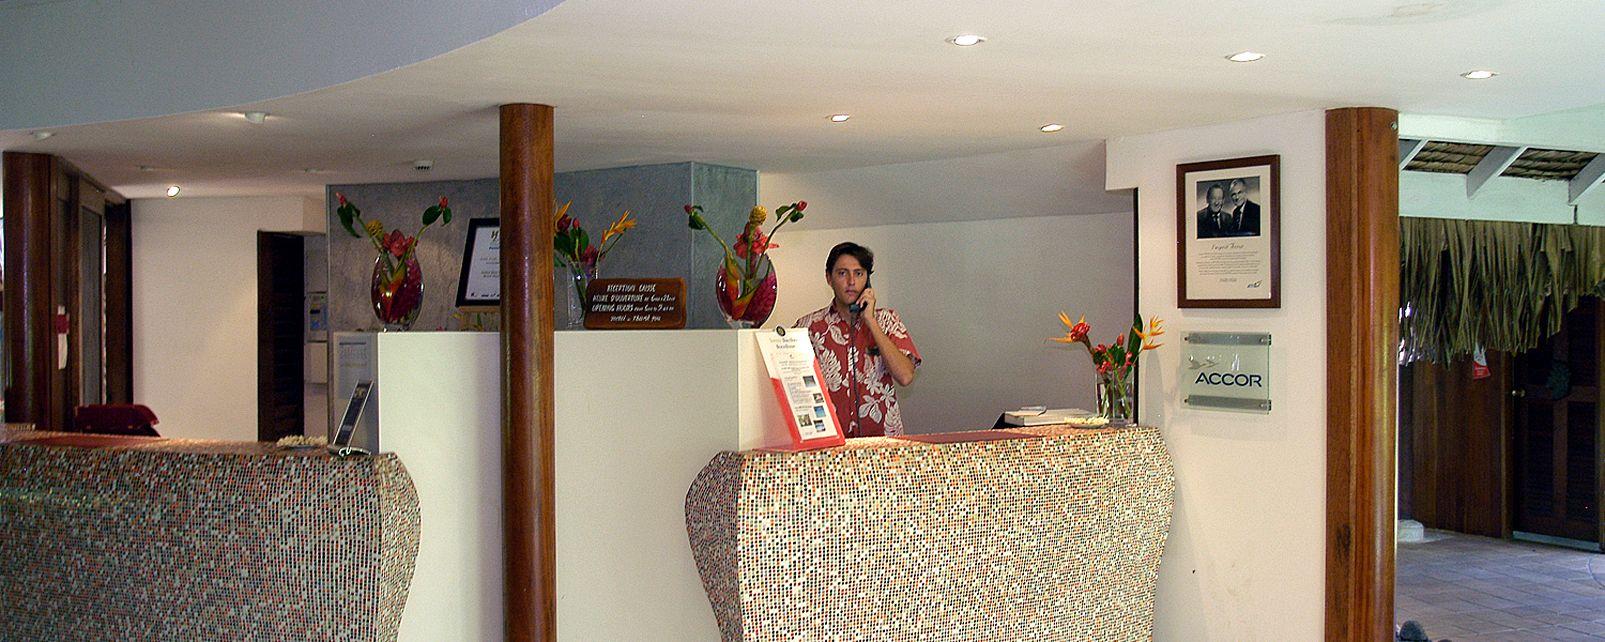 Hotel Sofitel Motu Bora Bora